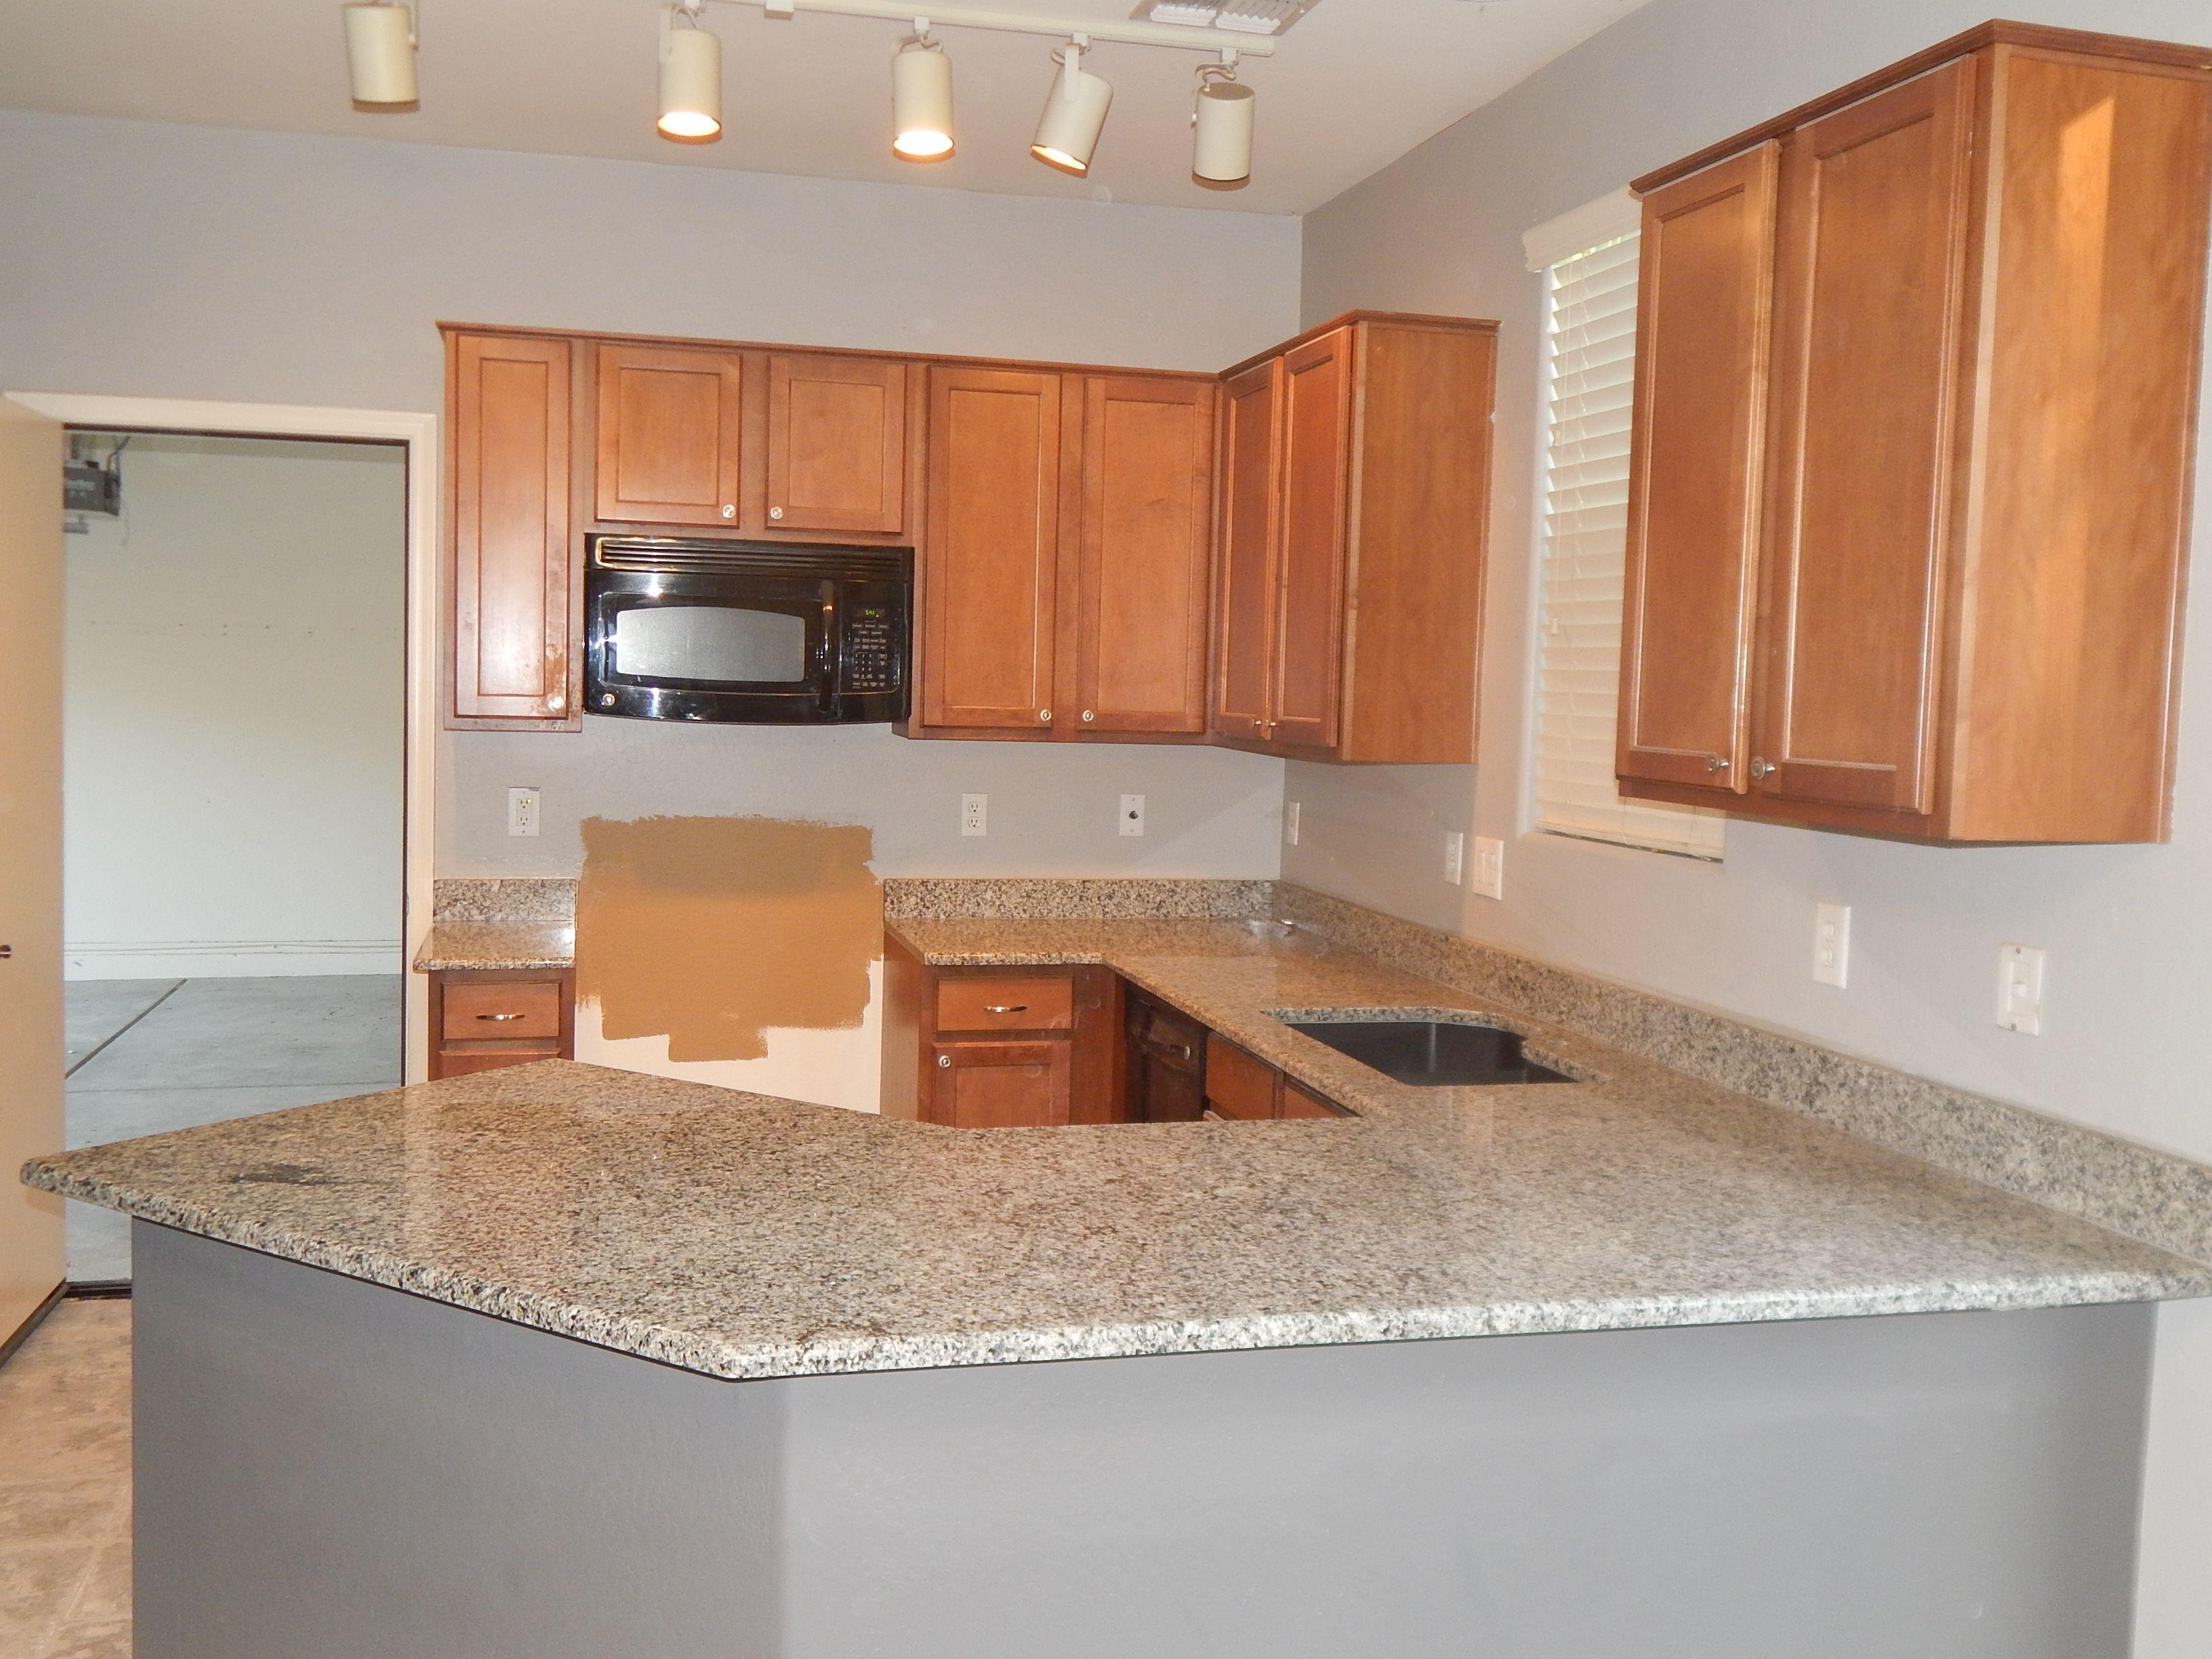 Kitchen Remodel With Azul Platino Granite And Top Radius Edge. Call For A  Free Estimate